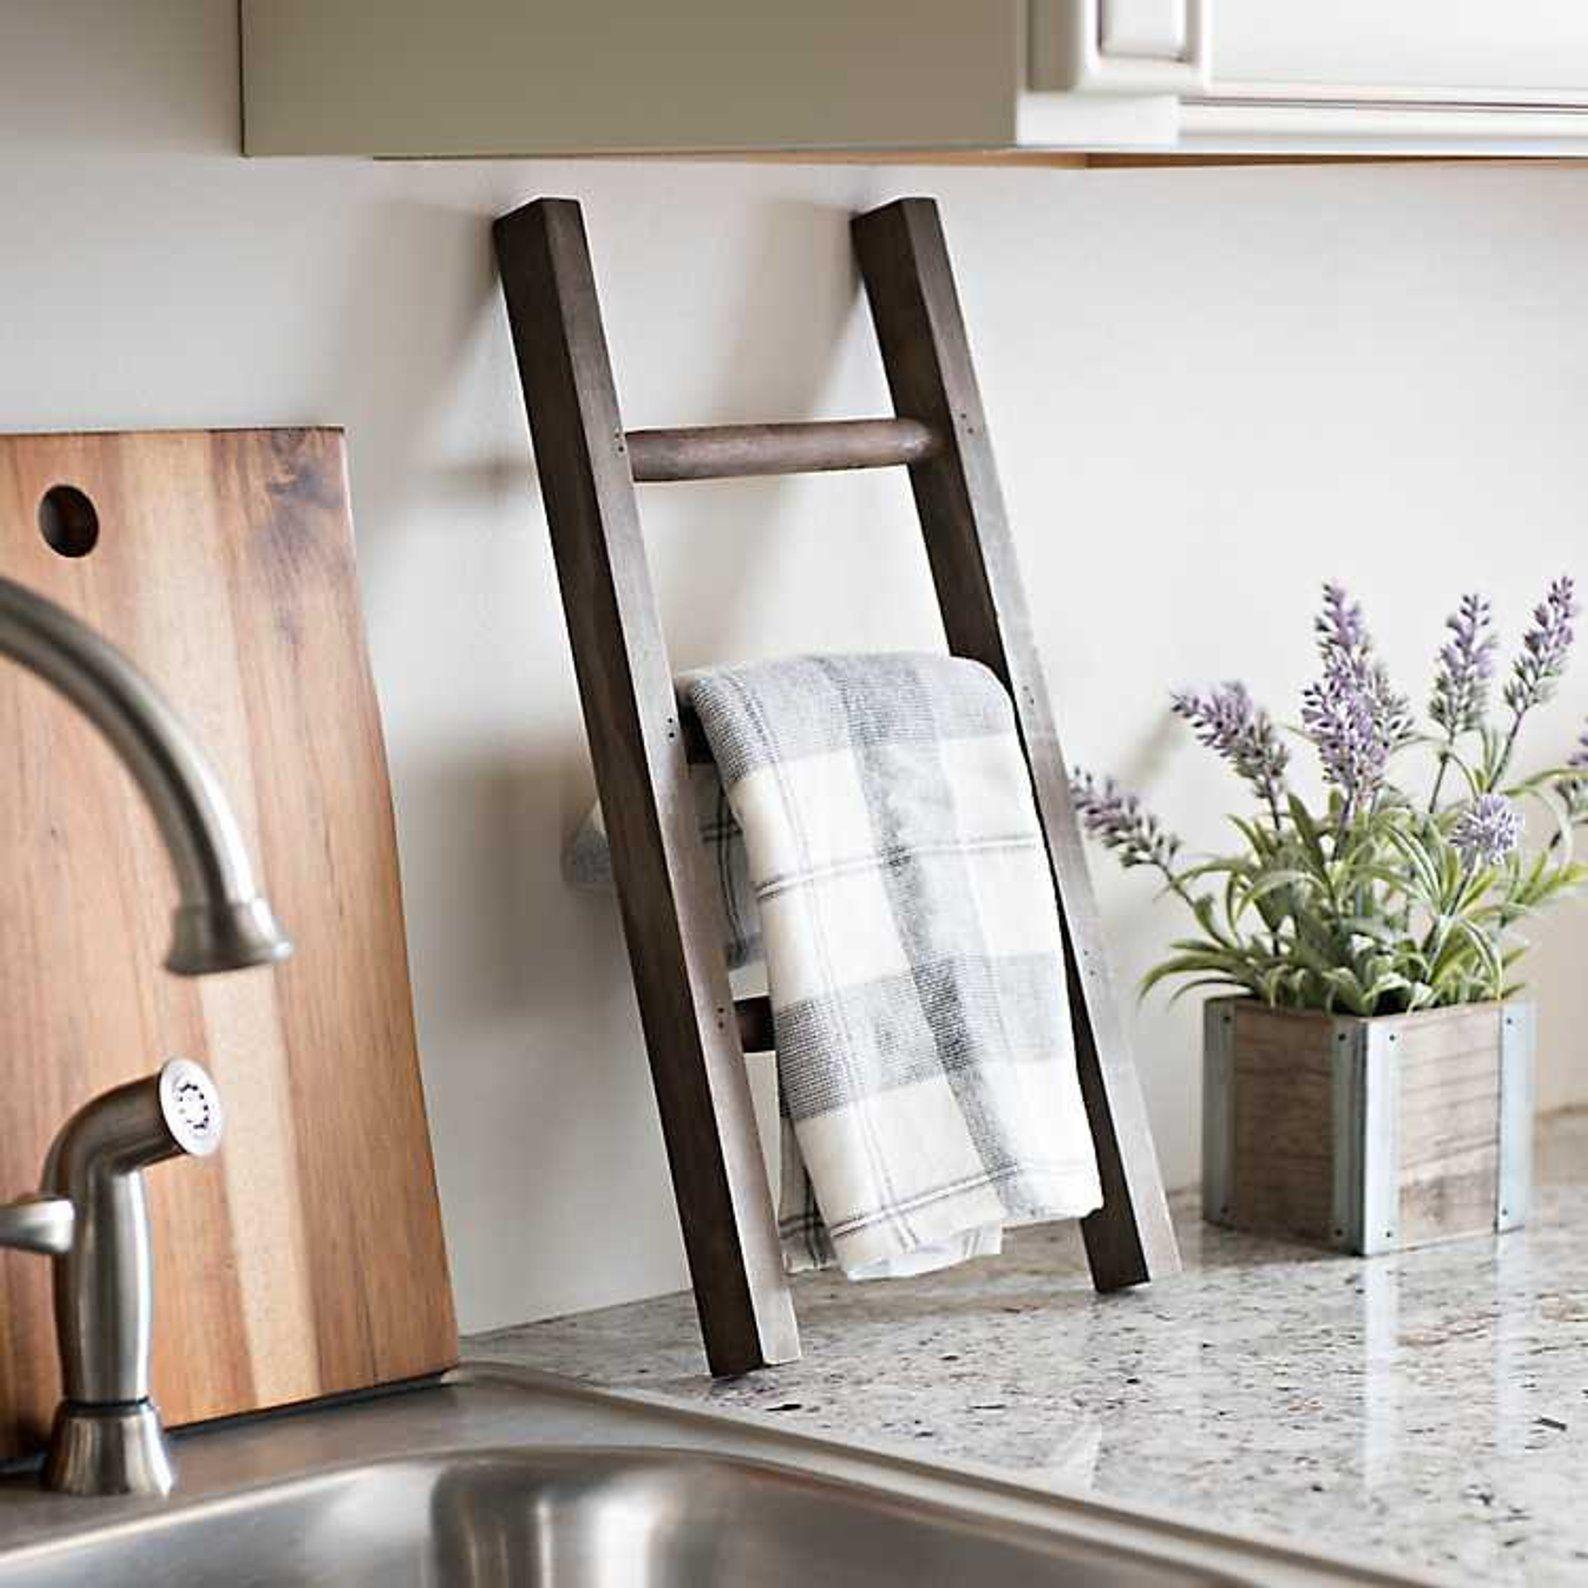 Wooden Towel Rack Kitchen Decor Farmhouse Decor Counter Etsy Home Decor Home Diy Diy Home Decor